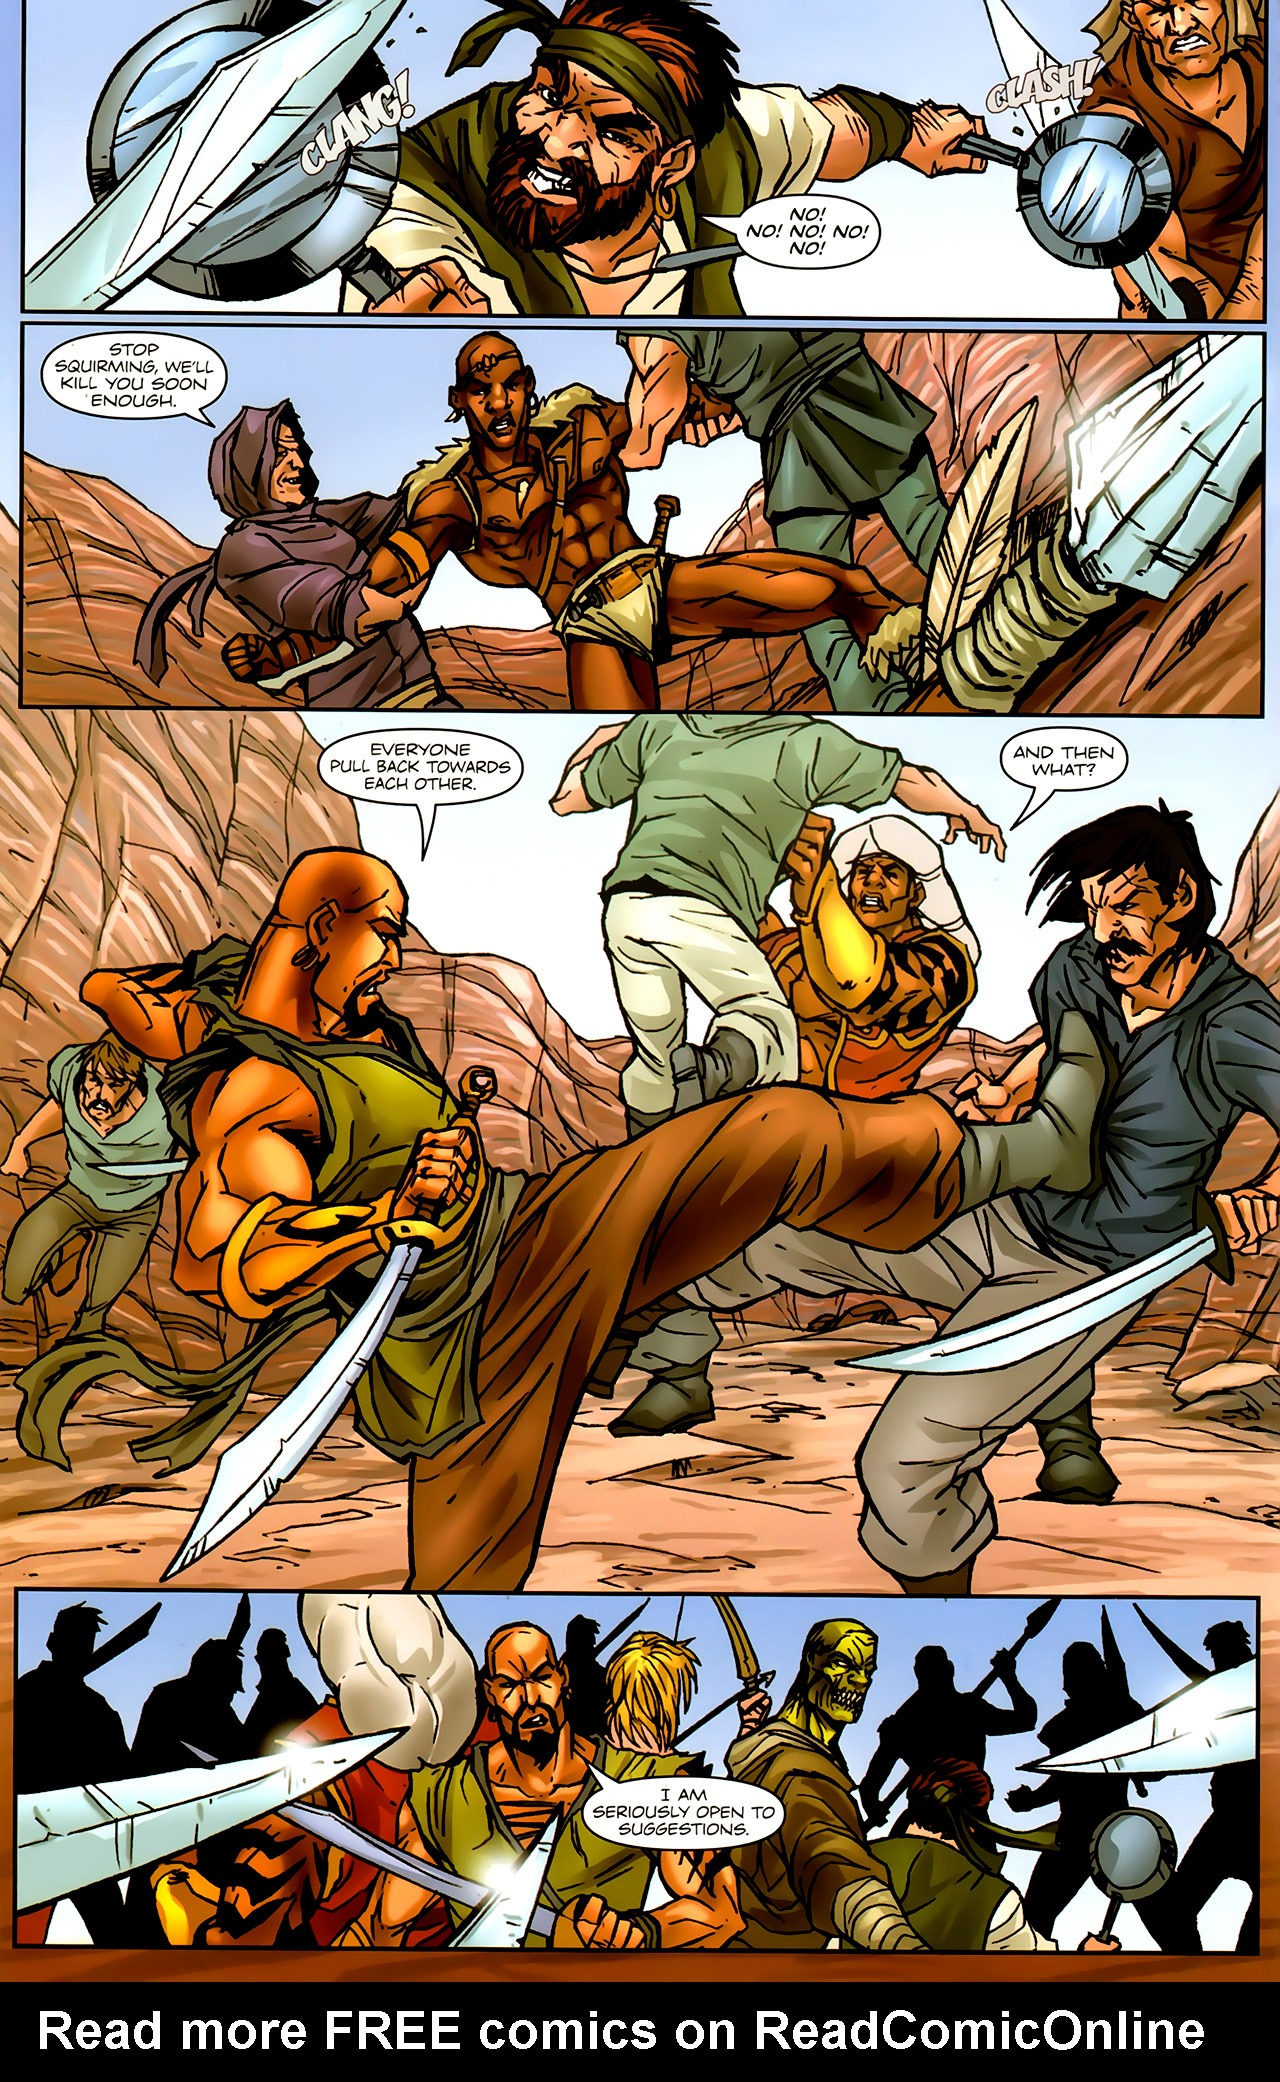 Read online 1001 Arabian Nights: The Adventures of Sinbad comic -  Issue #9 - 18